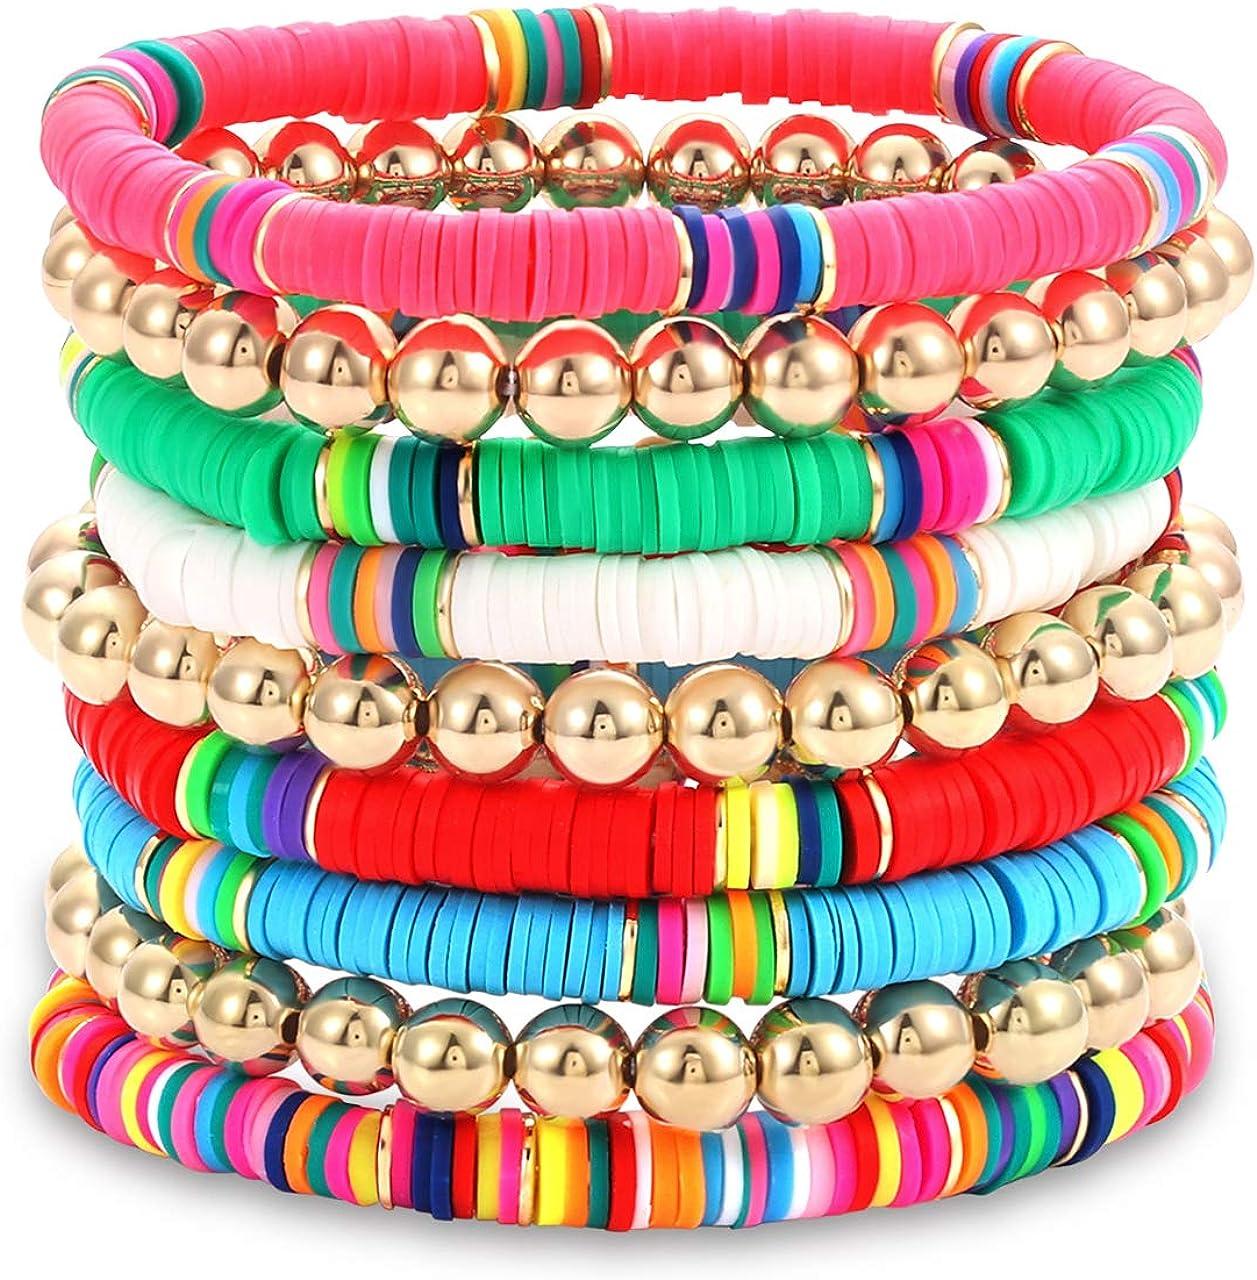 beaded bracelet beaded jewelry stretch bracelet beach fashion gift for him Heishi bracelet gift for her